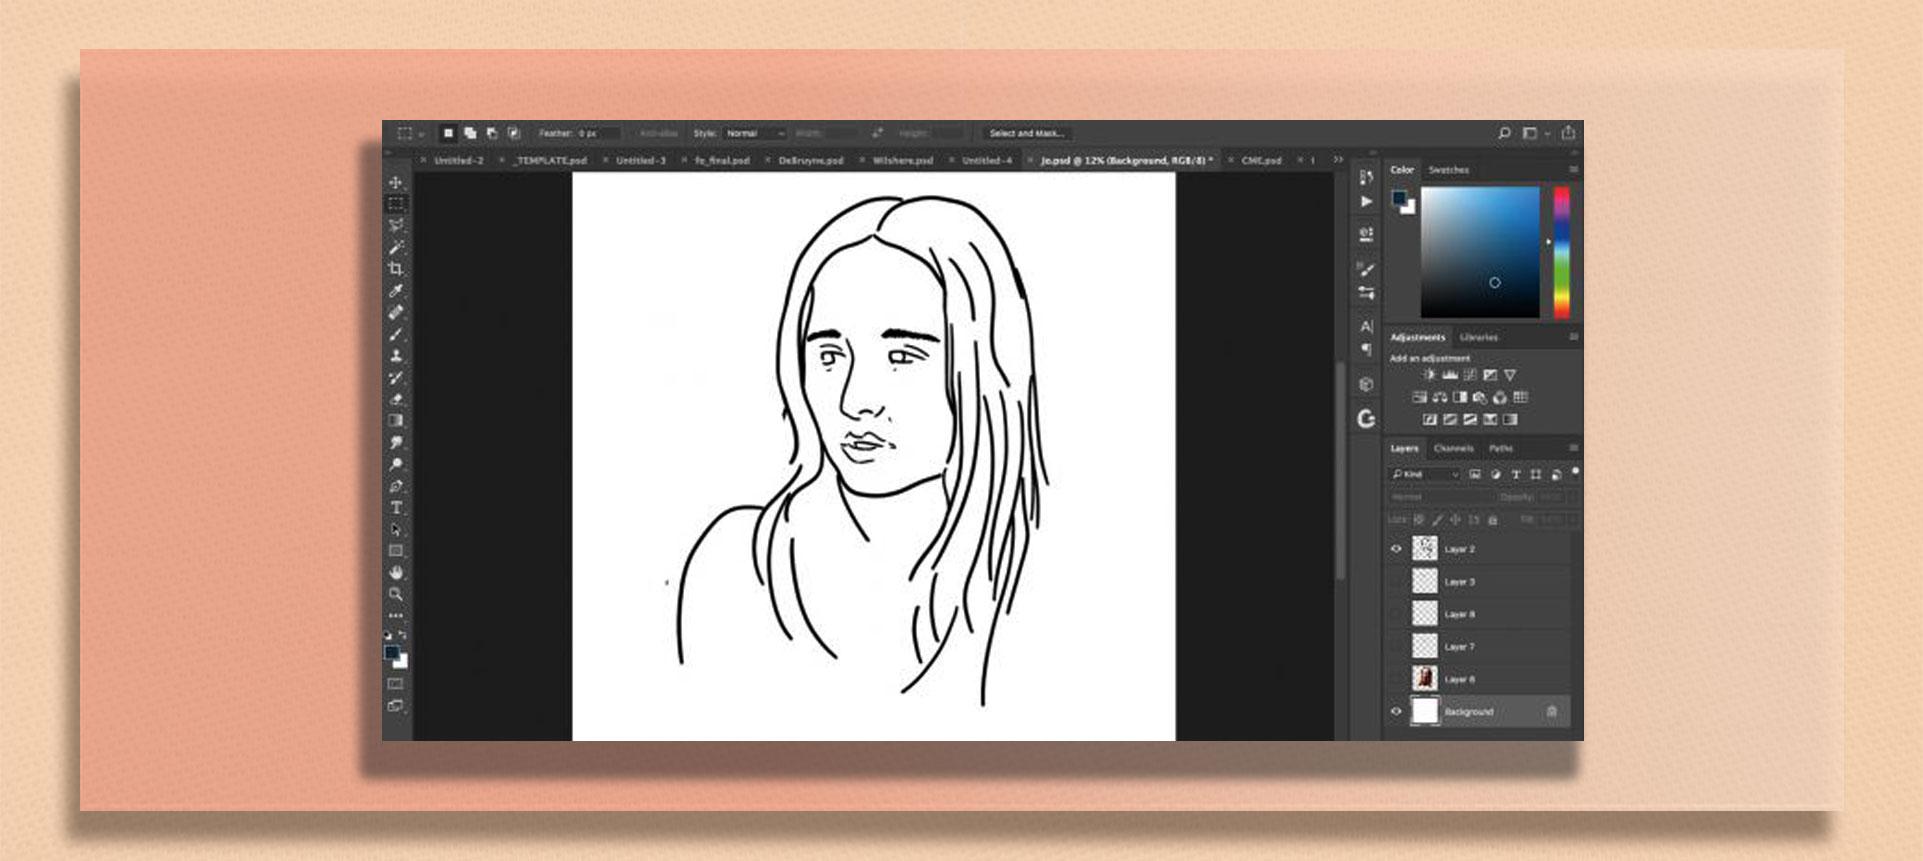 brush tool  photoshop4 - چگونه از ابزار براش در فتوشاپ استفاده کنیم